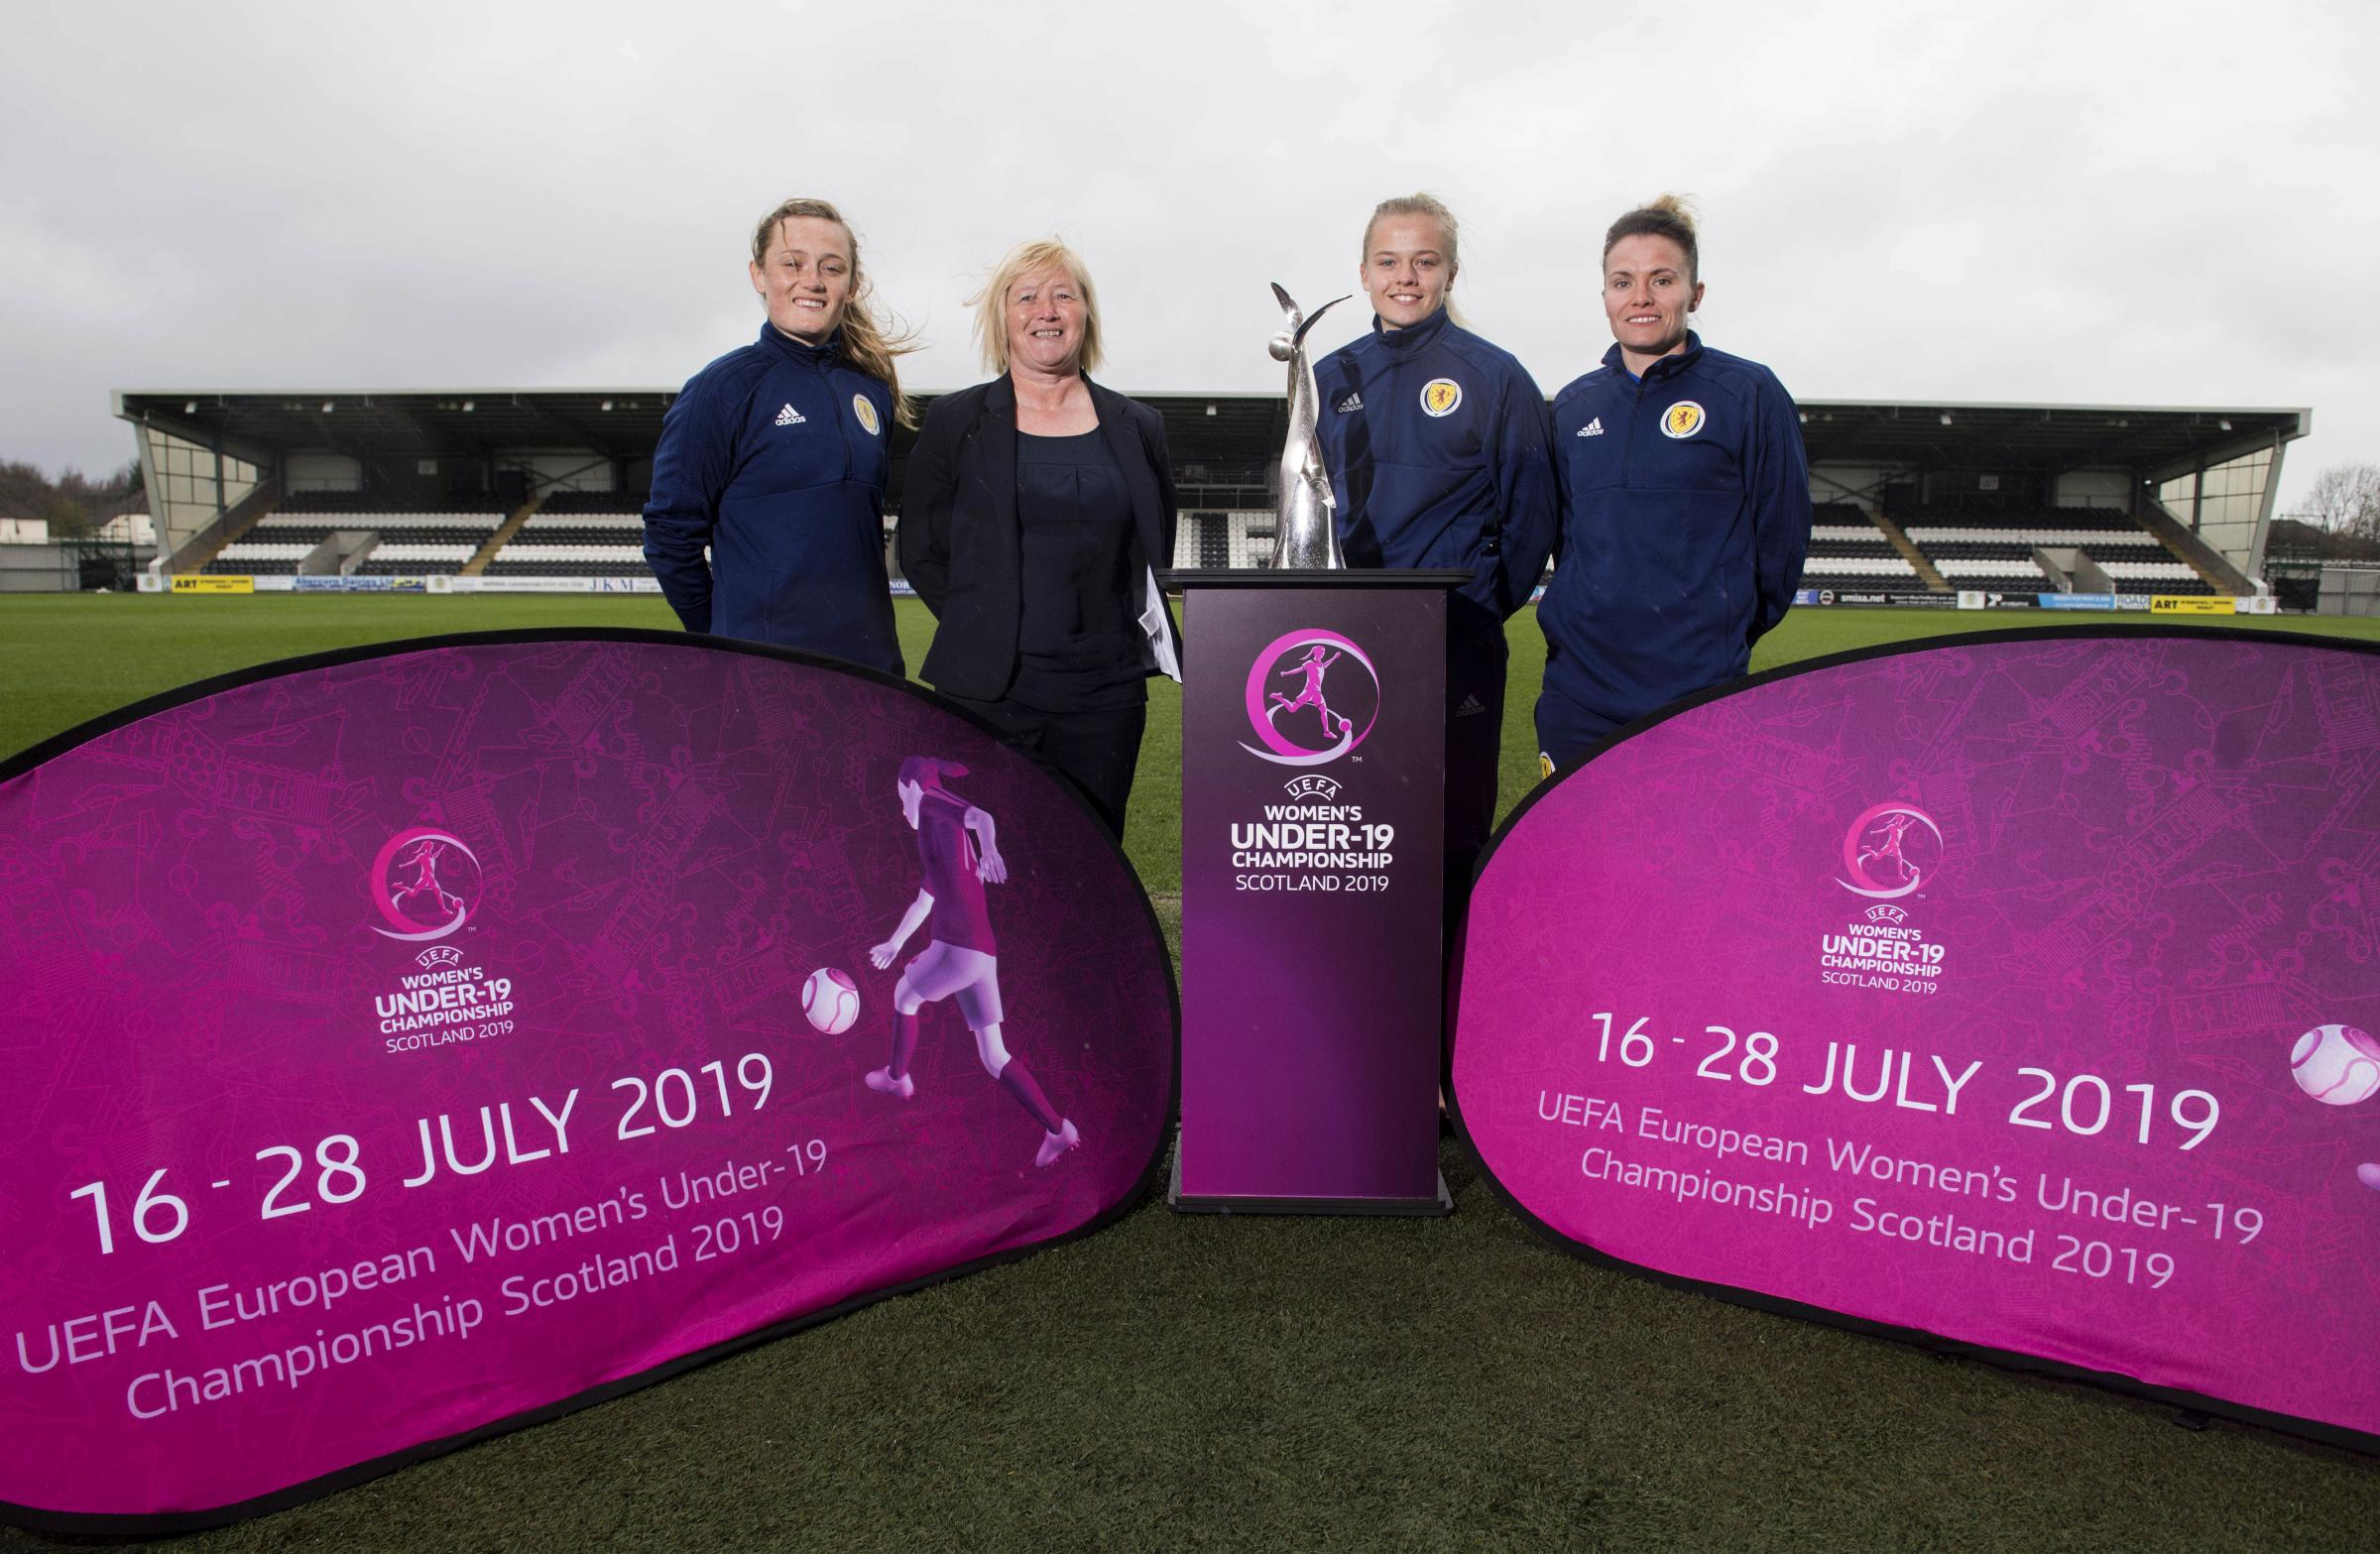 Glasgow's footballing talent launch UEFA Women's Under-19 Championship